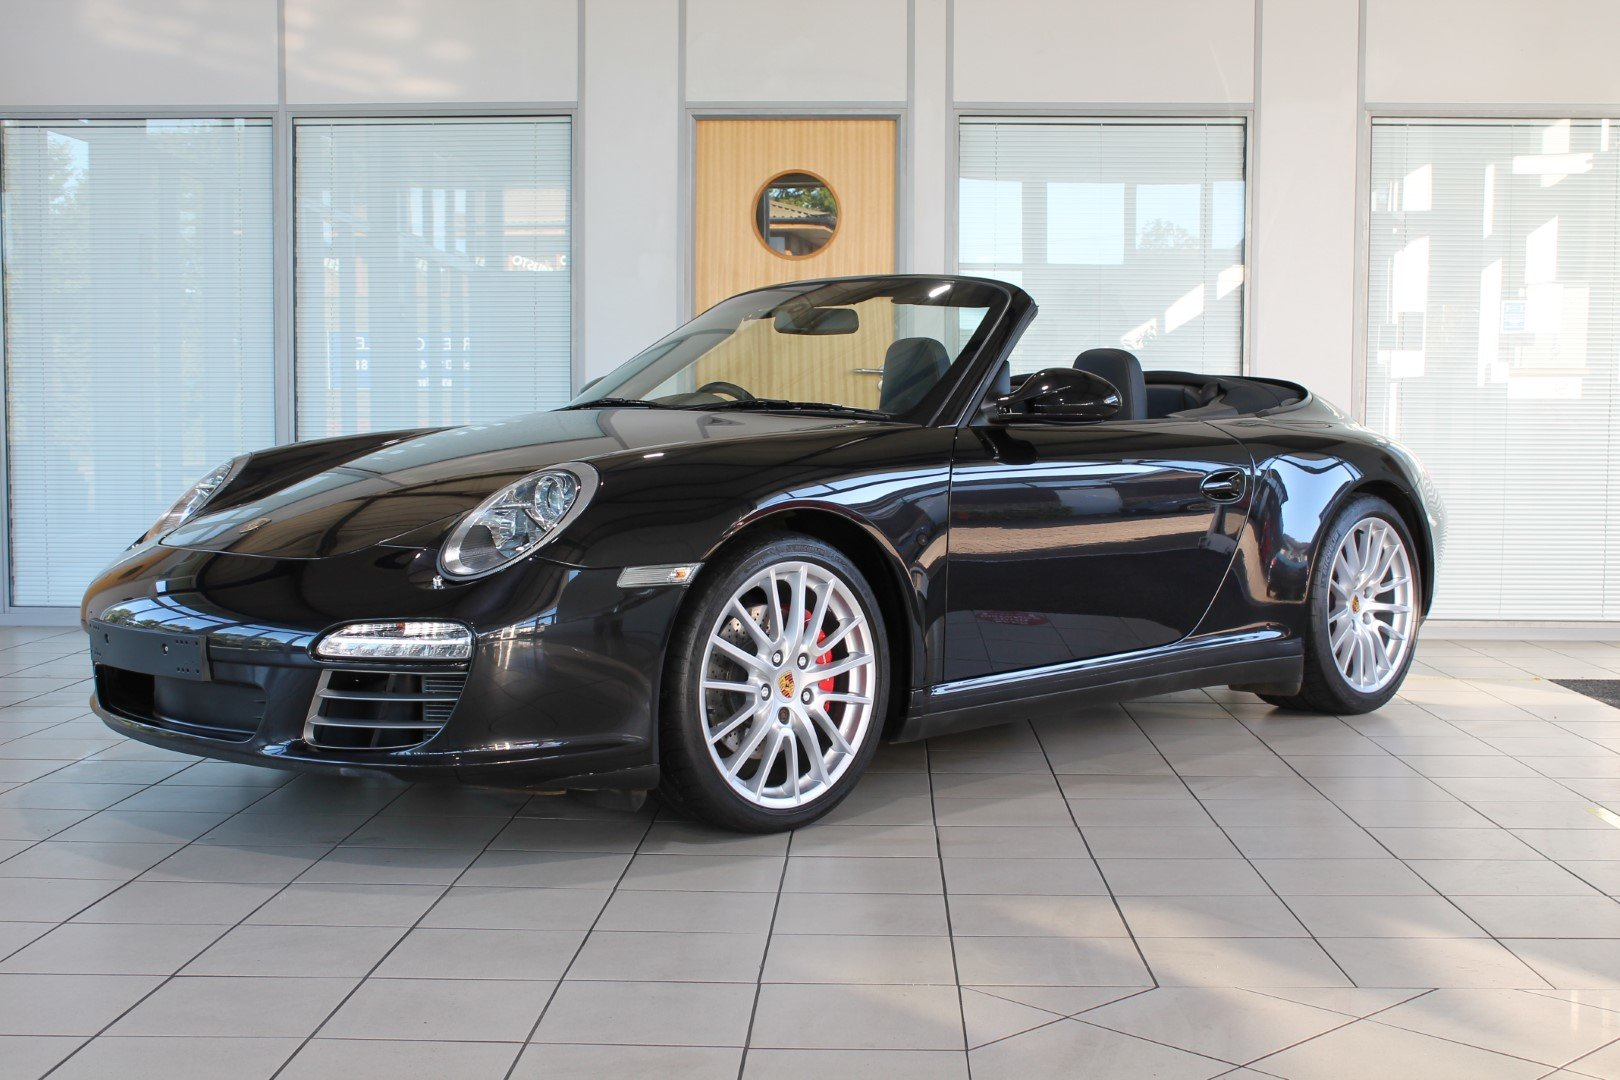 2009 Porsche 911 (997) 3.8 C4S PDK Cabriolet For Sale (picture 1 of 6)